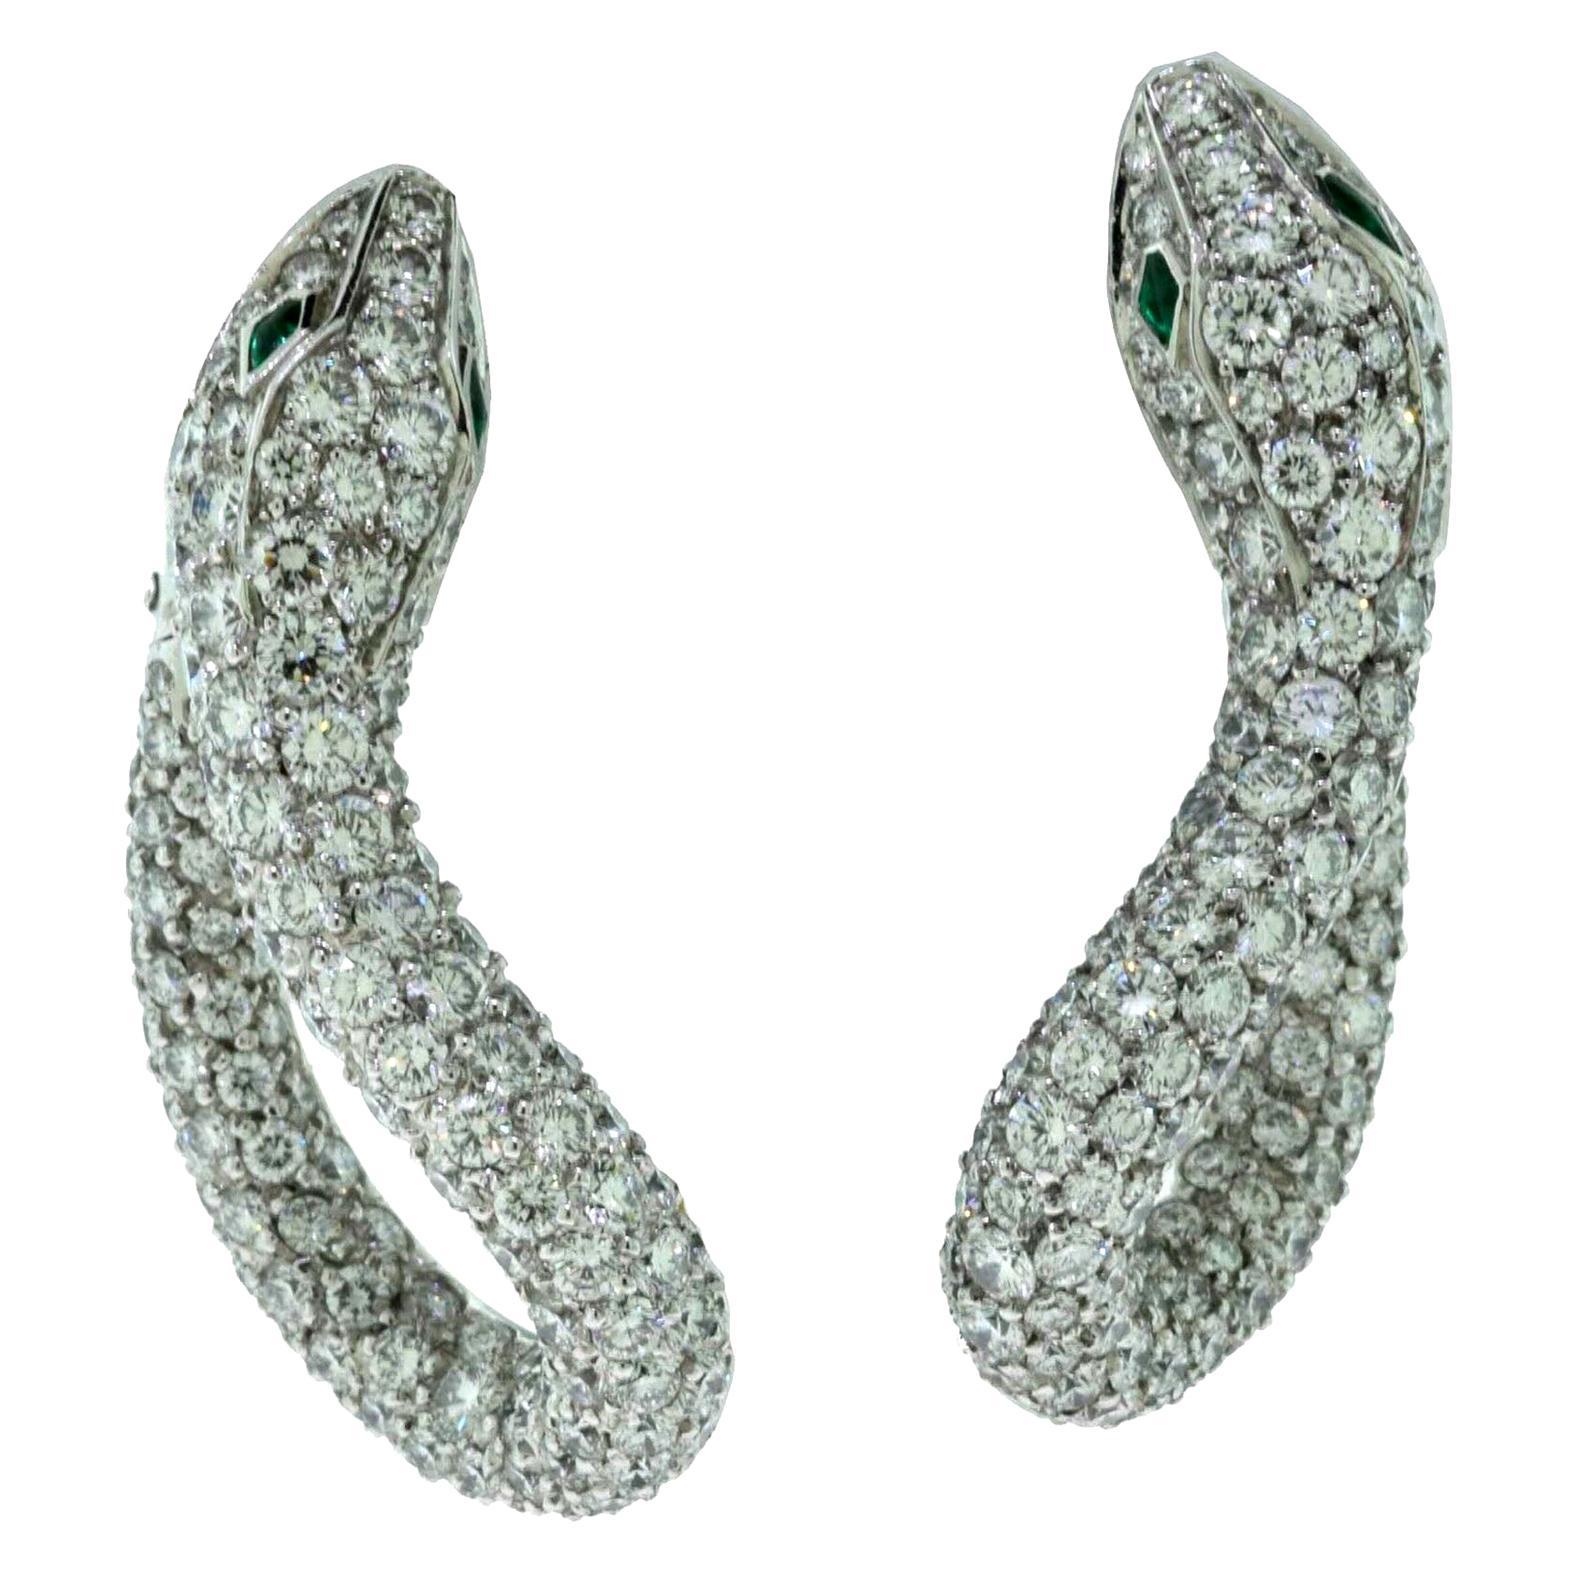 Boucheron Kaa Snake Emerald and Diamond Cocktail Clip-On White Gold Earrings